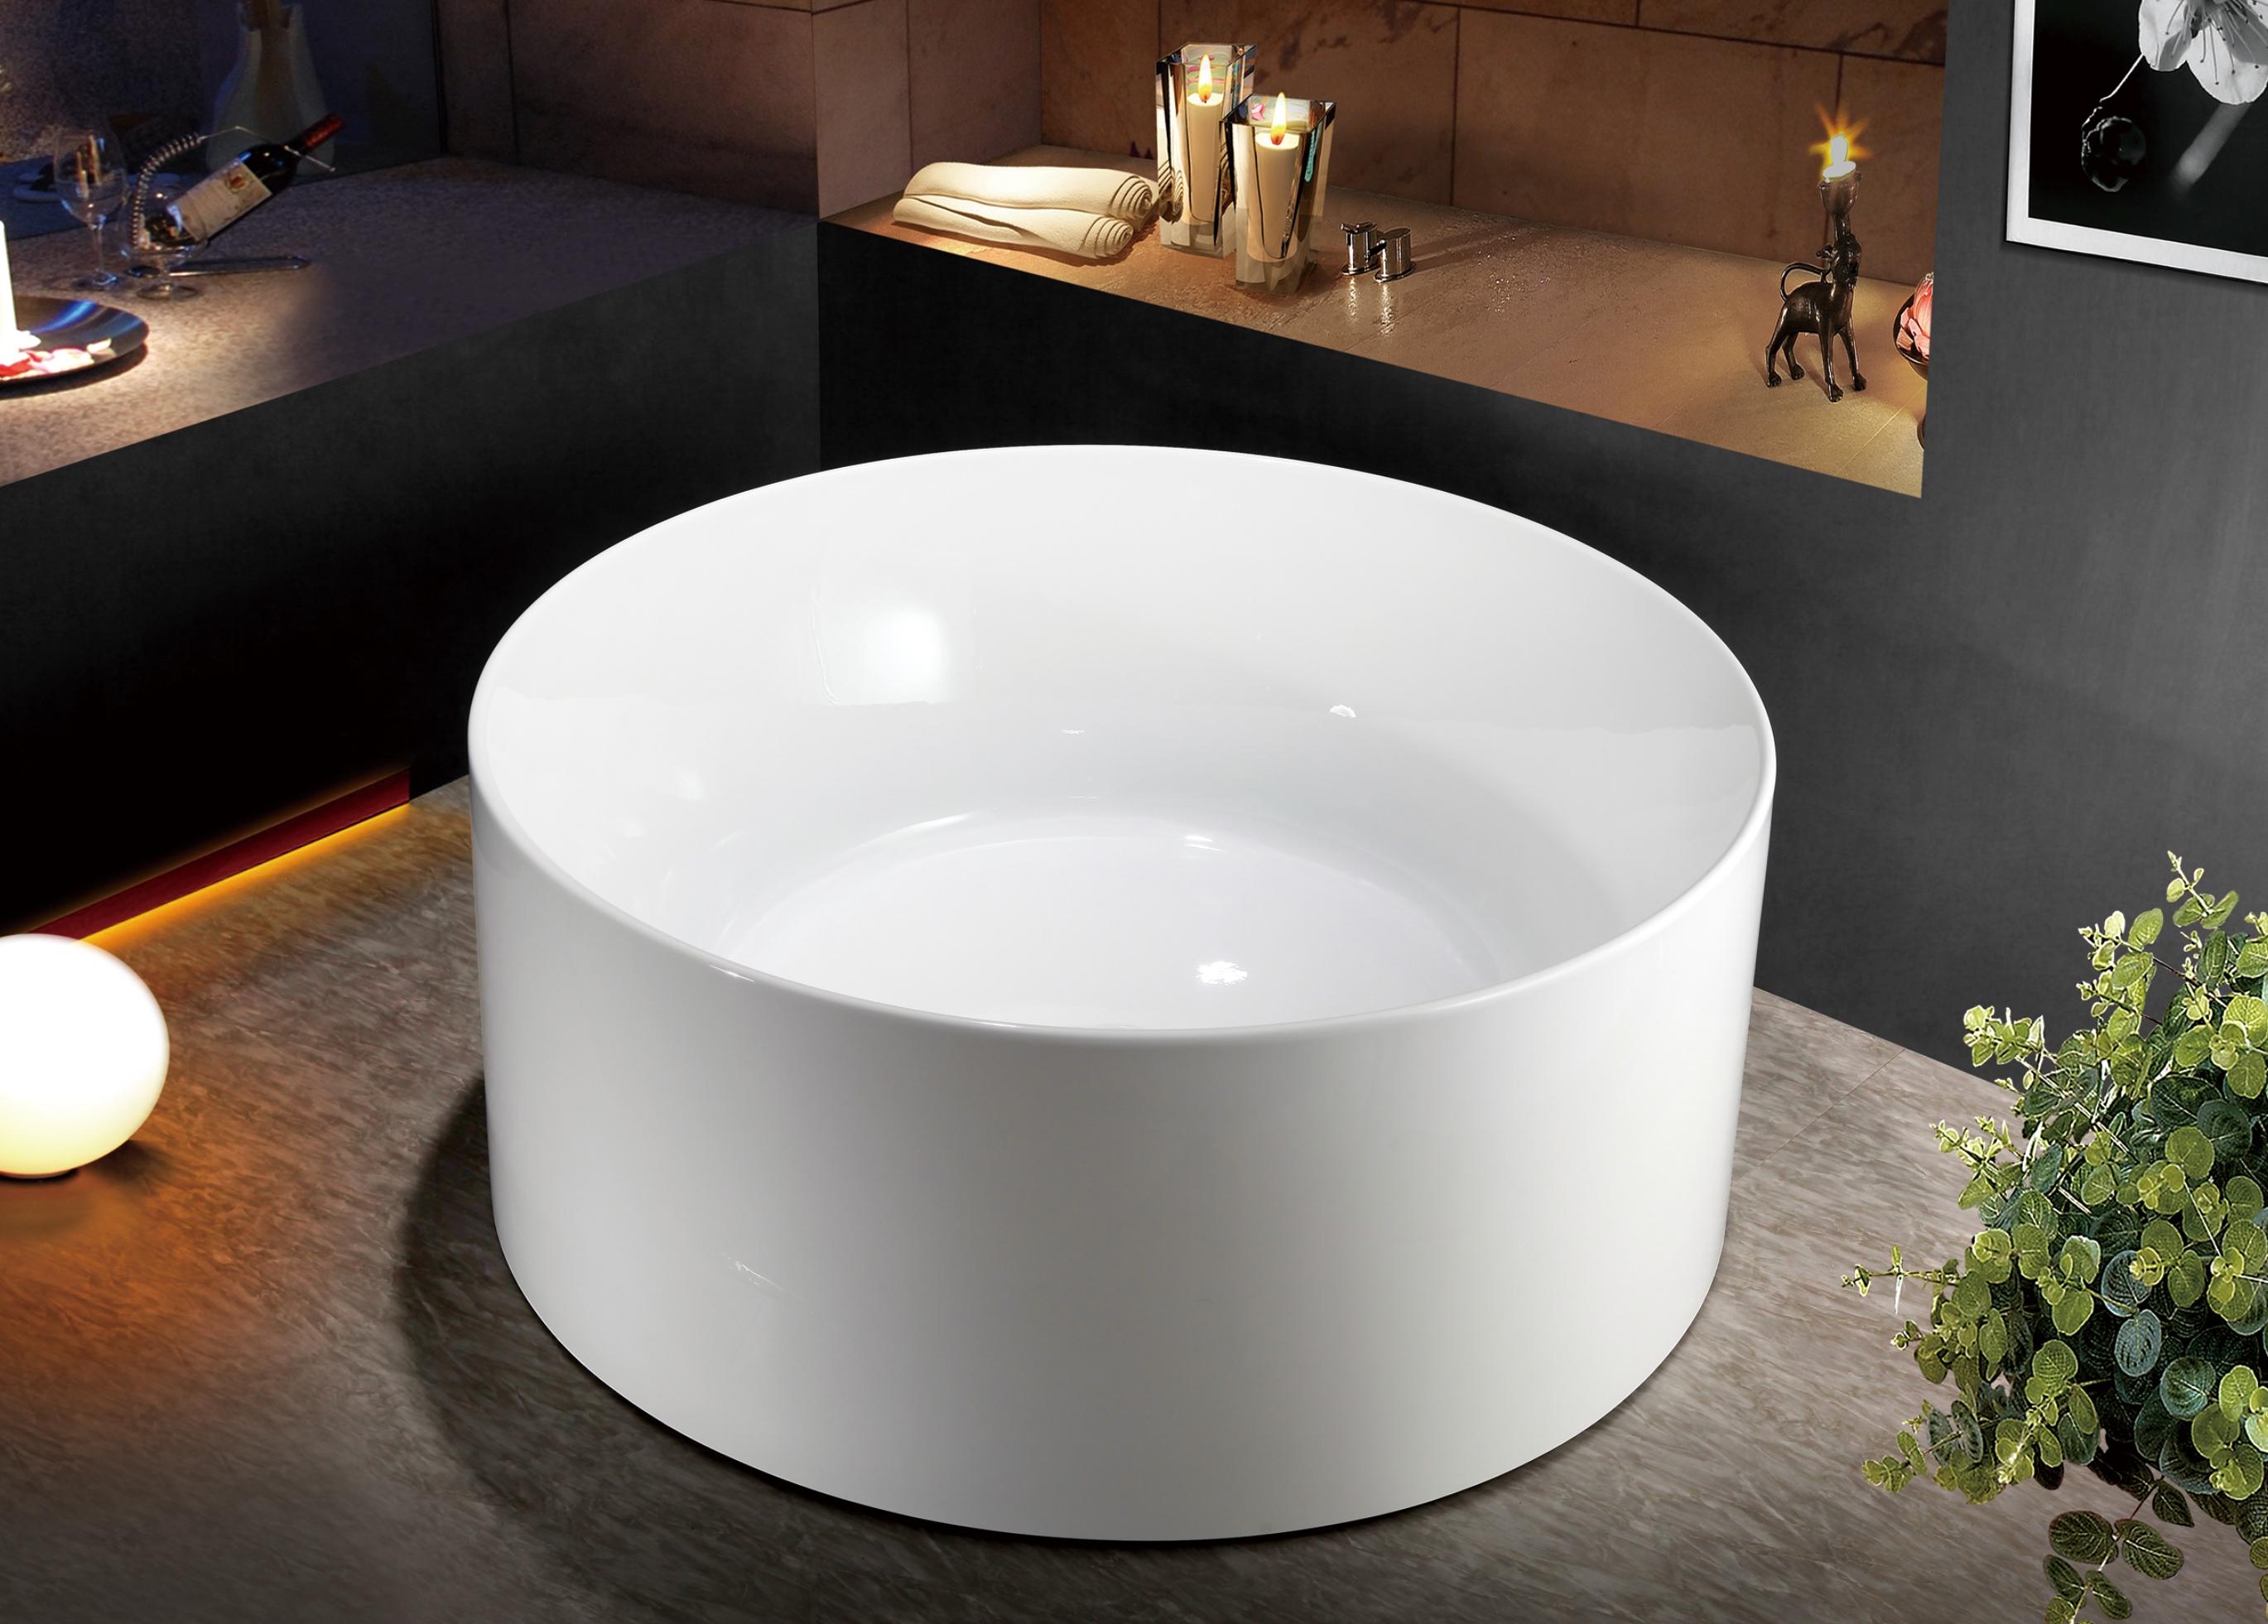 Round freestanding bath rondo bath eurotrend for Eurotrend bathrooms